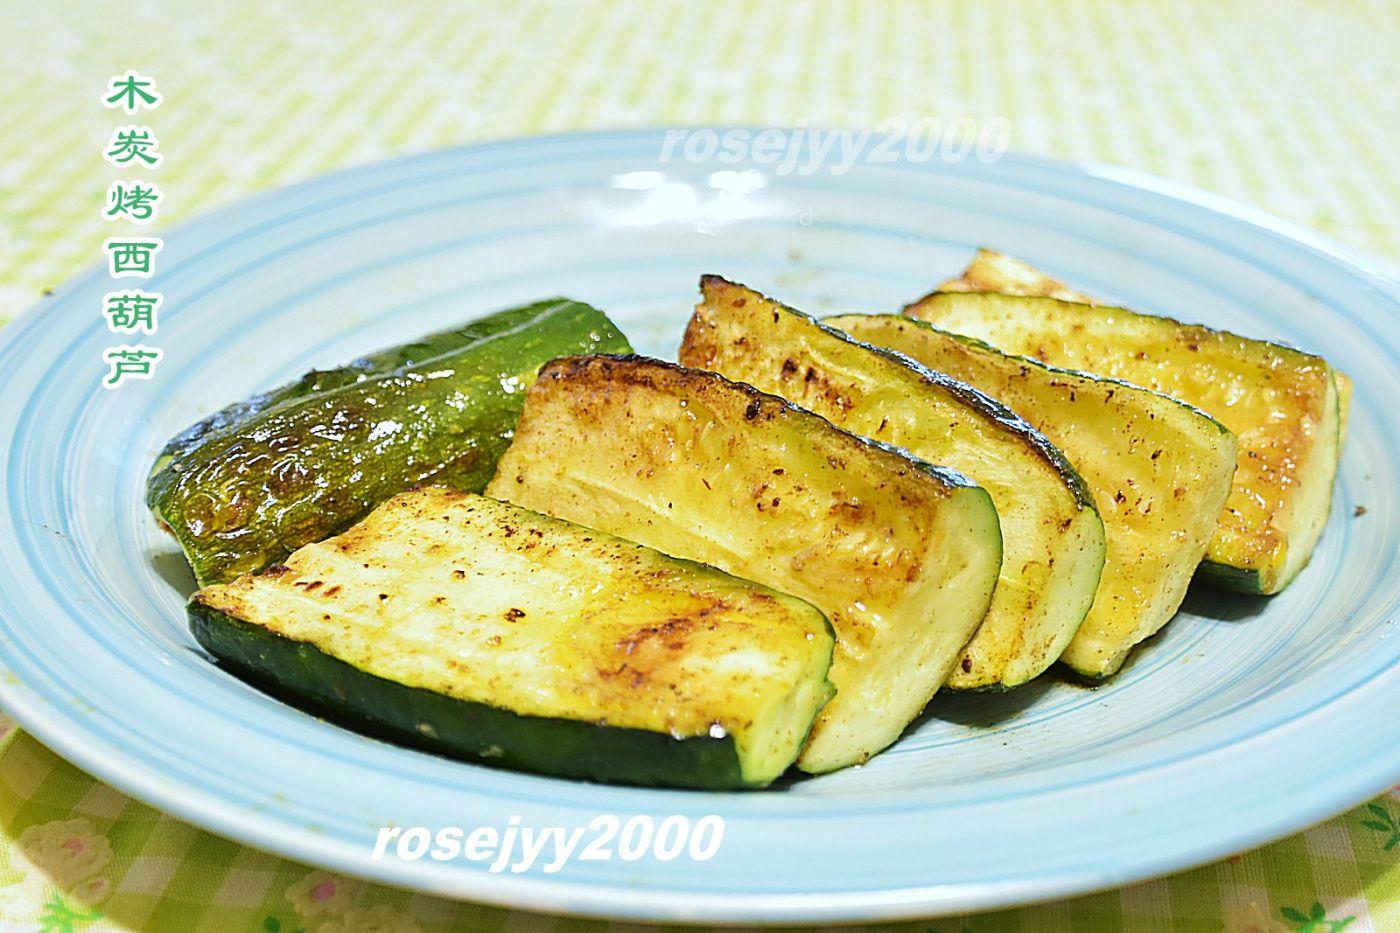 Charcoal Grill 木炭烧烤西葫芦(Zucchini )_图1-1